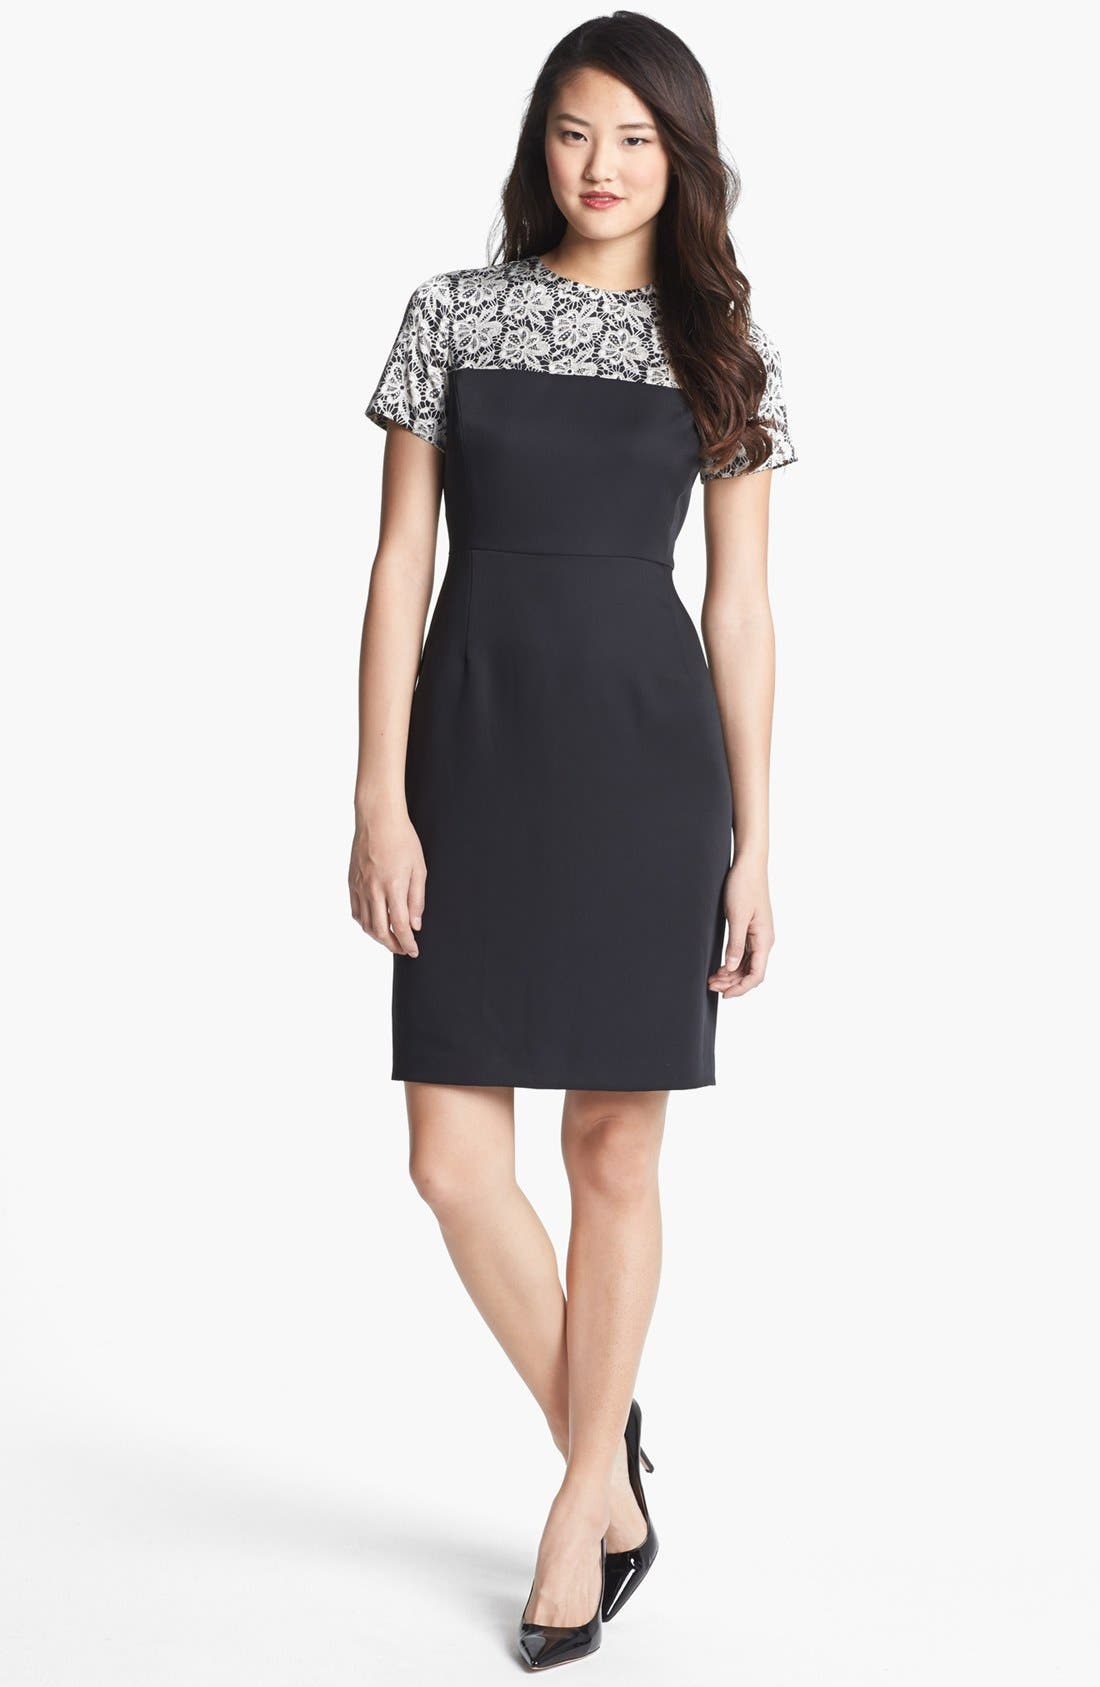 Main Image - Vince Camuto Lace Print Crepe Dress